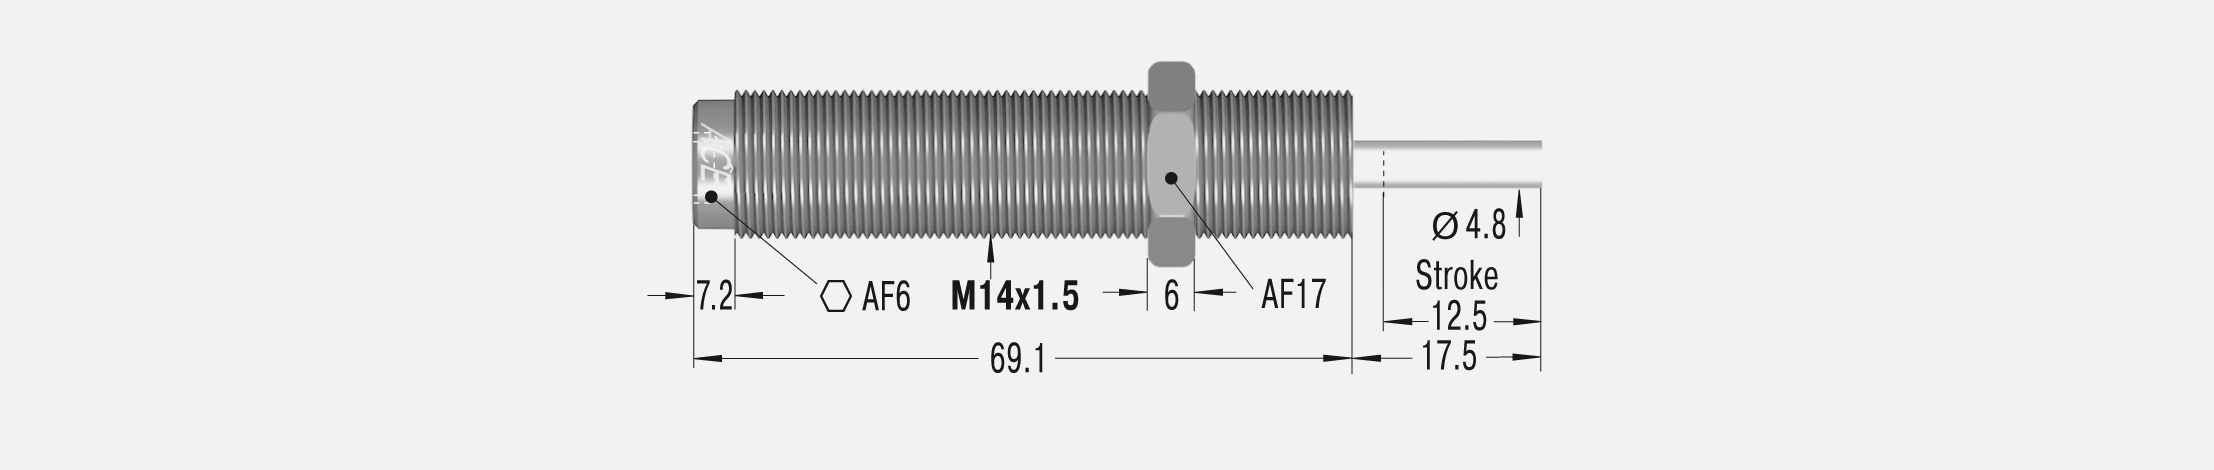 MC150EUM-V4A